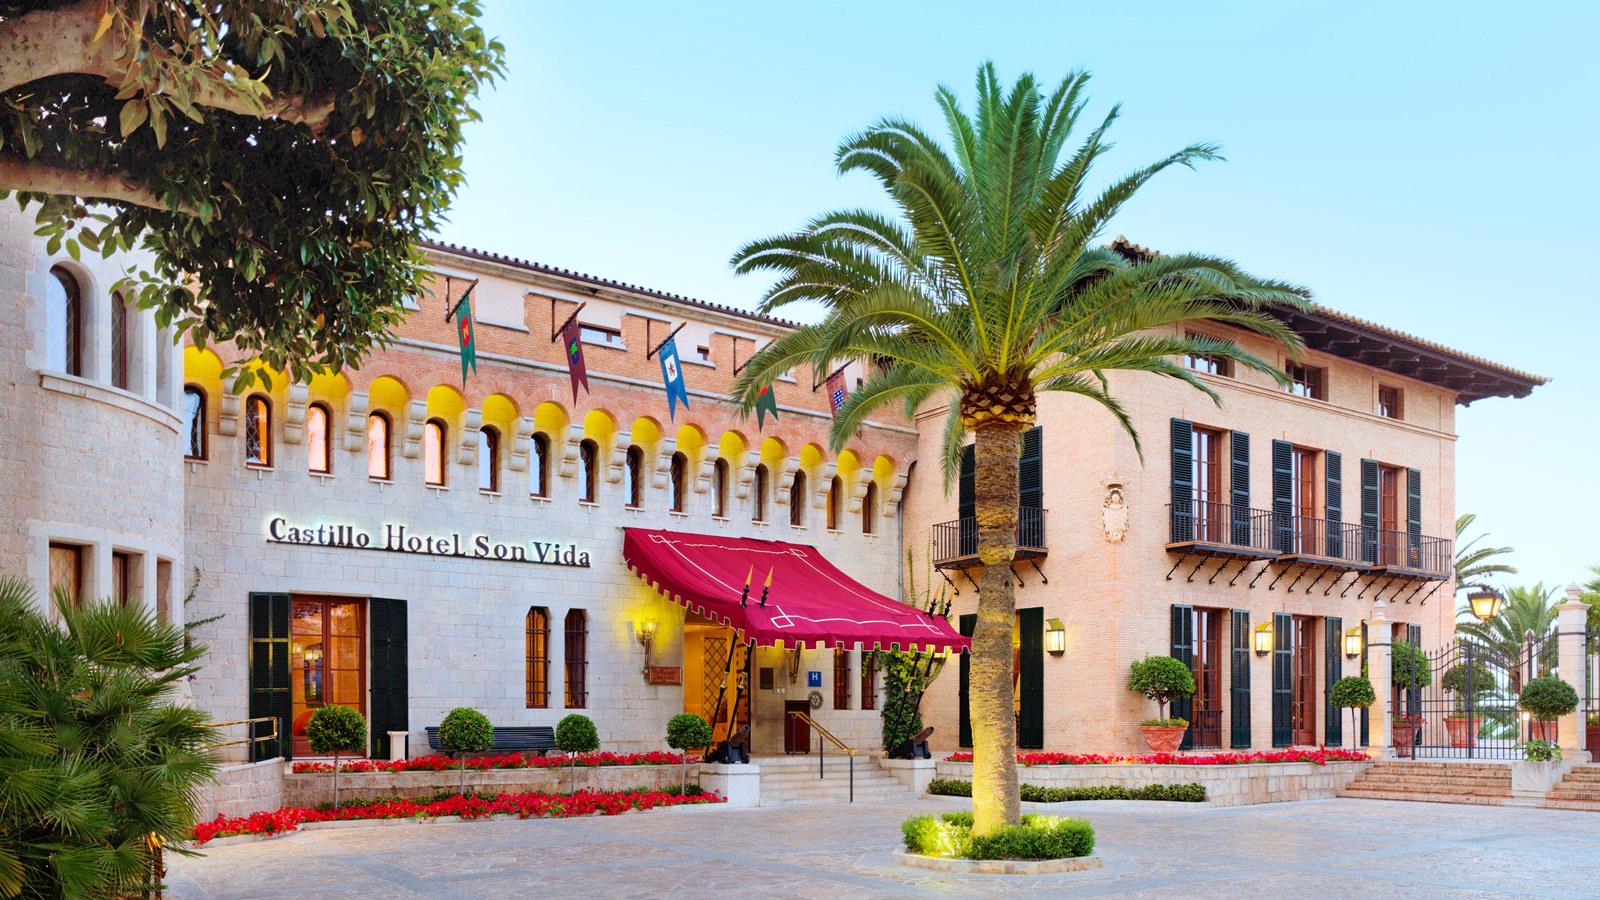 My Hotel Castillo Hotel Son Vida Mallorca Spain